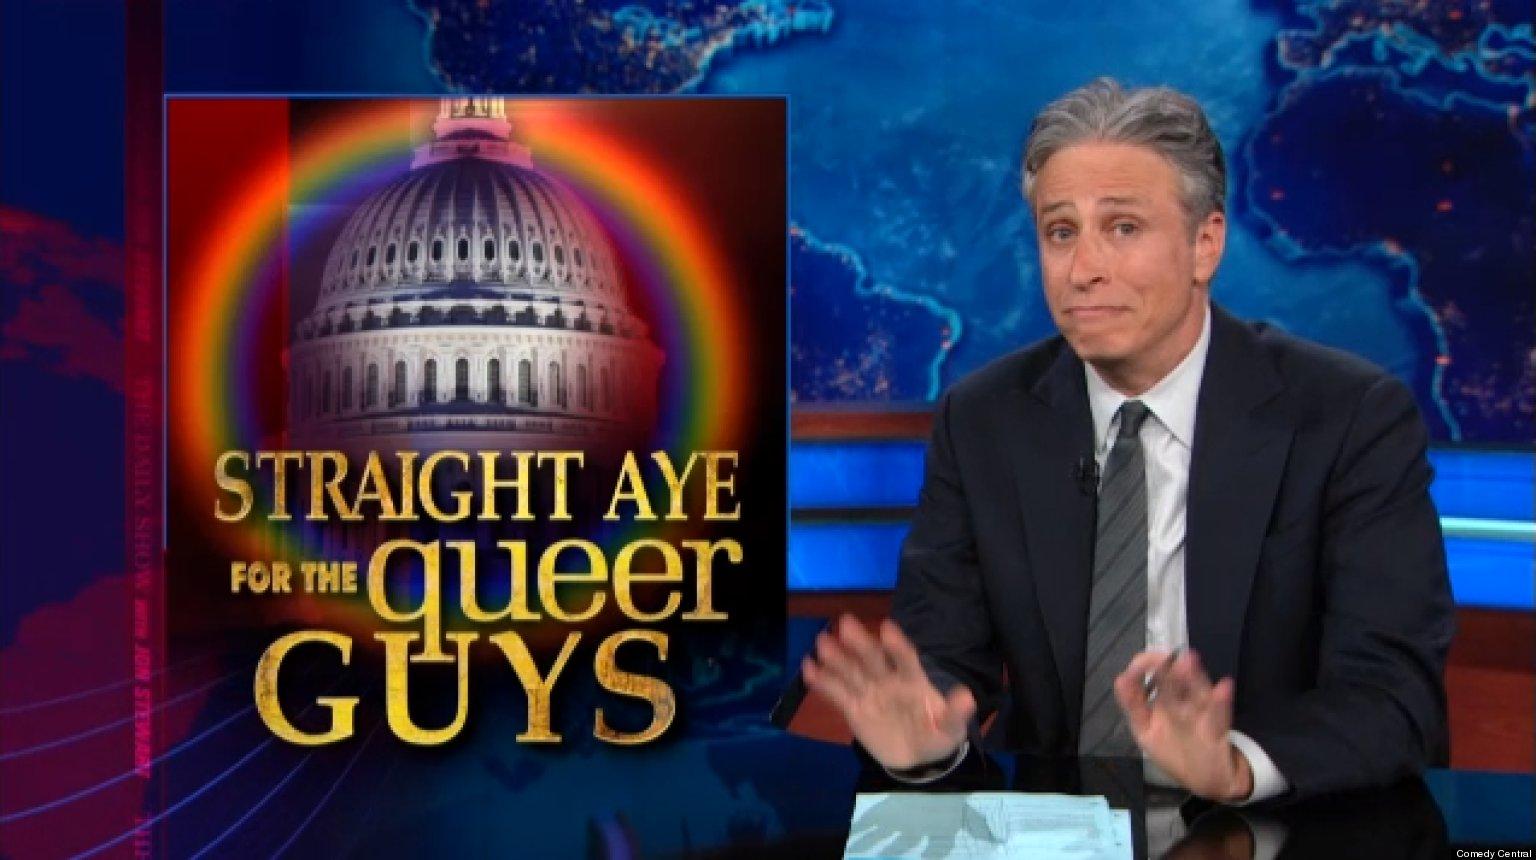 gay us president